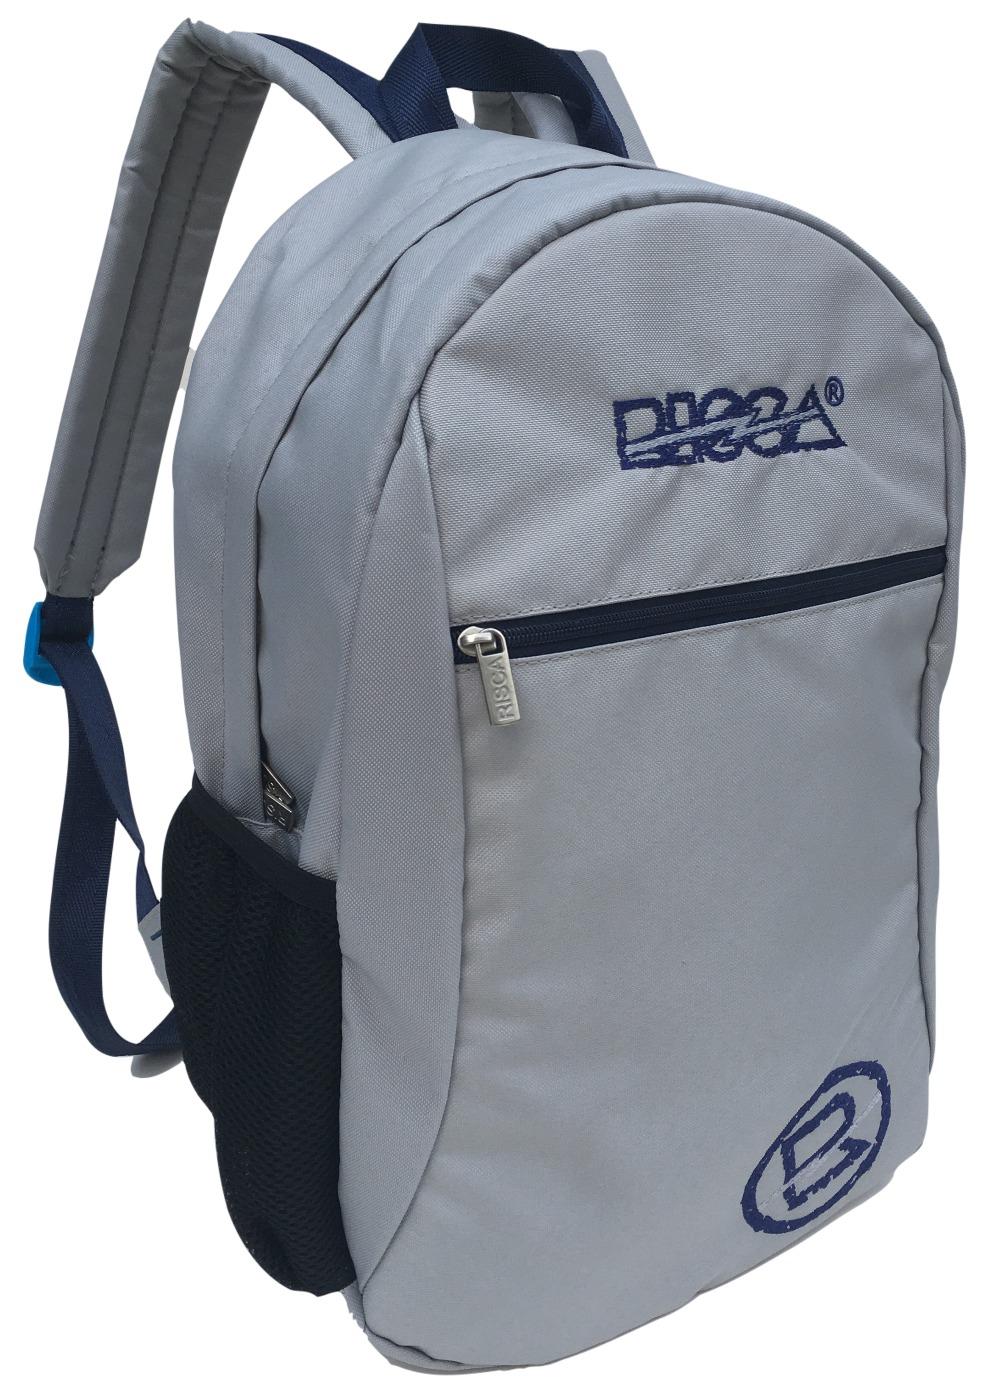 Mochila Risca 1169 - Cz Prata/Azul